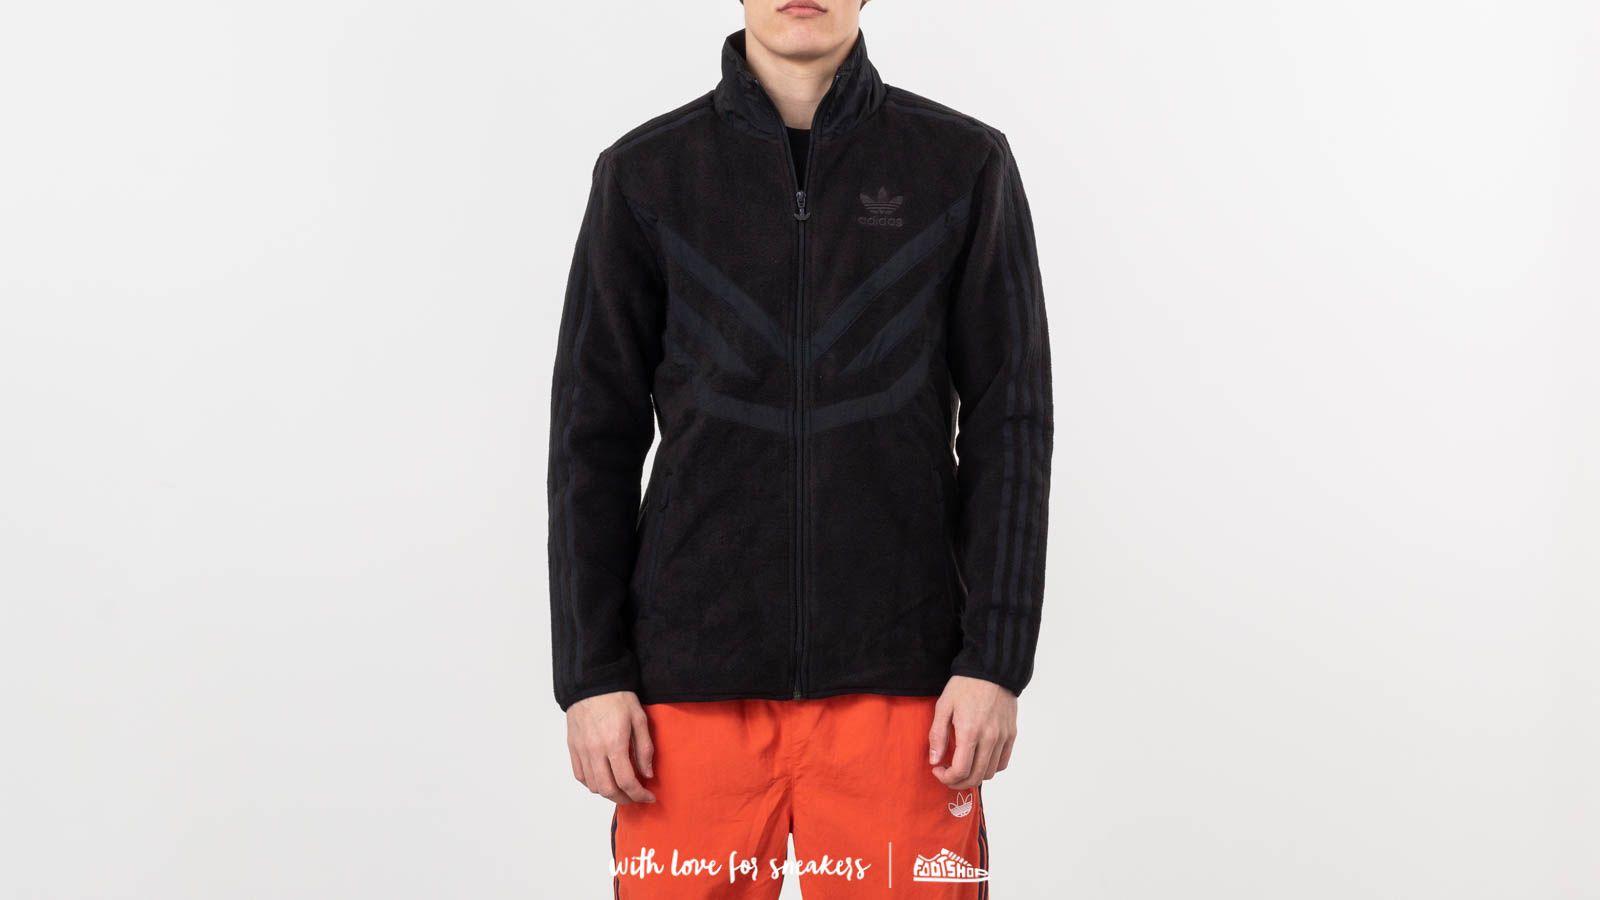 adidas Polar Fleece Track Jacket Black at a great price 240 лв купете в Footshop